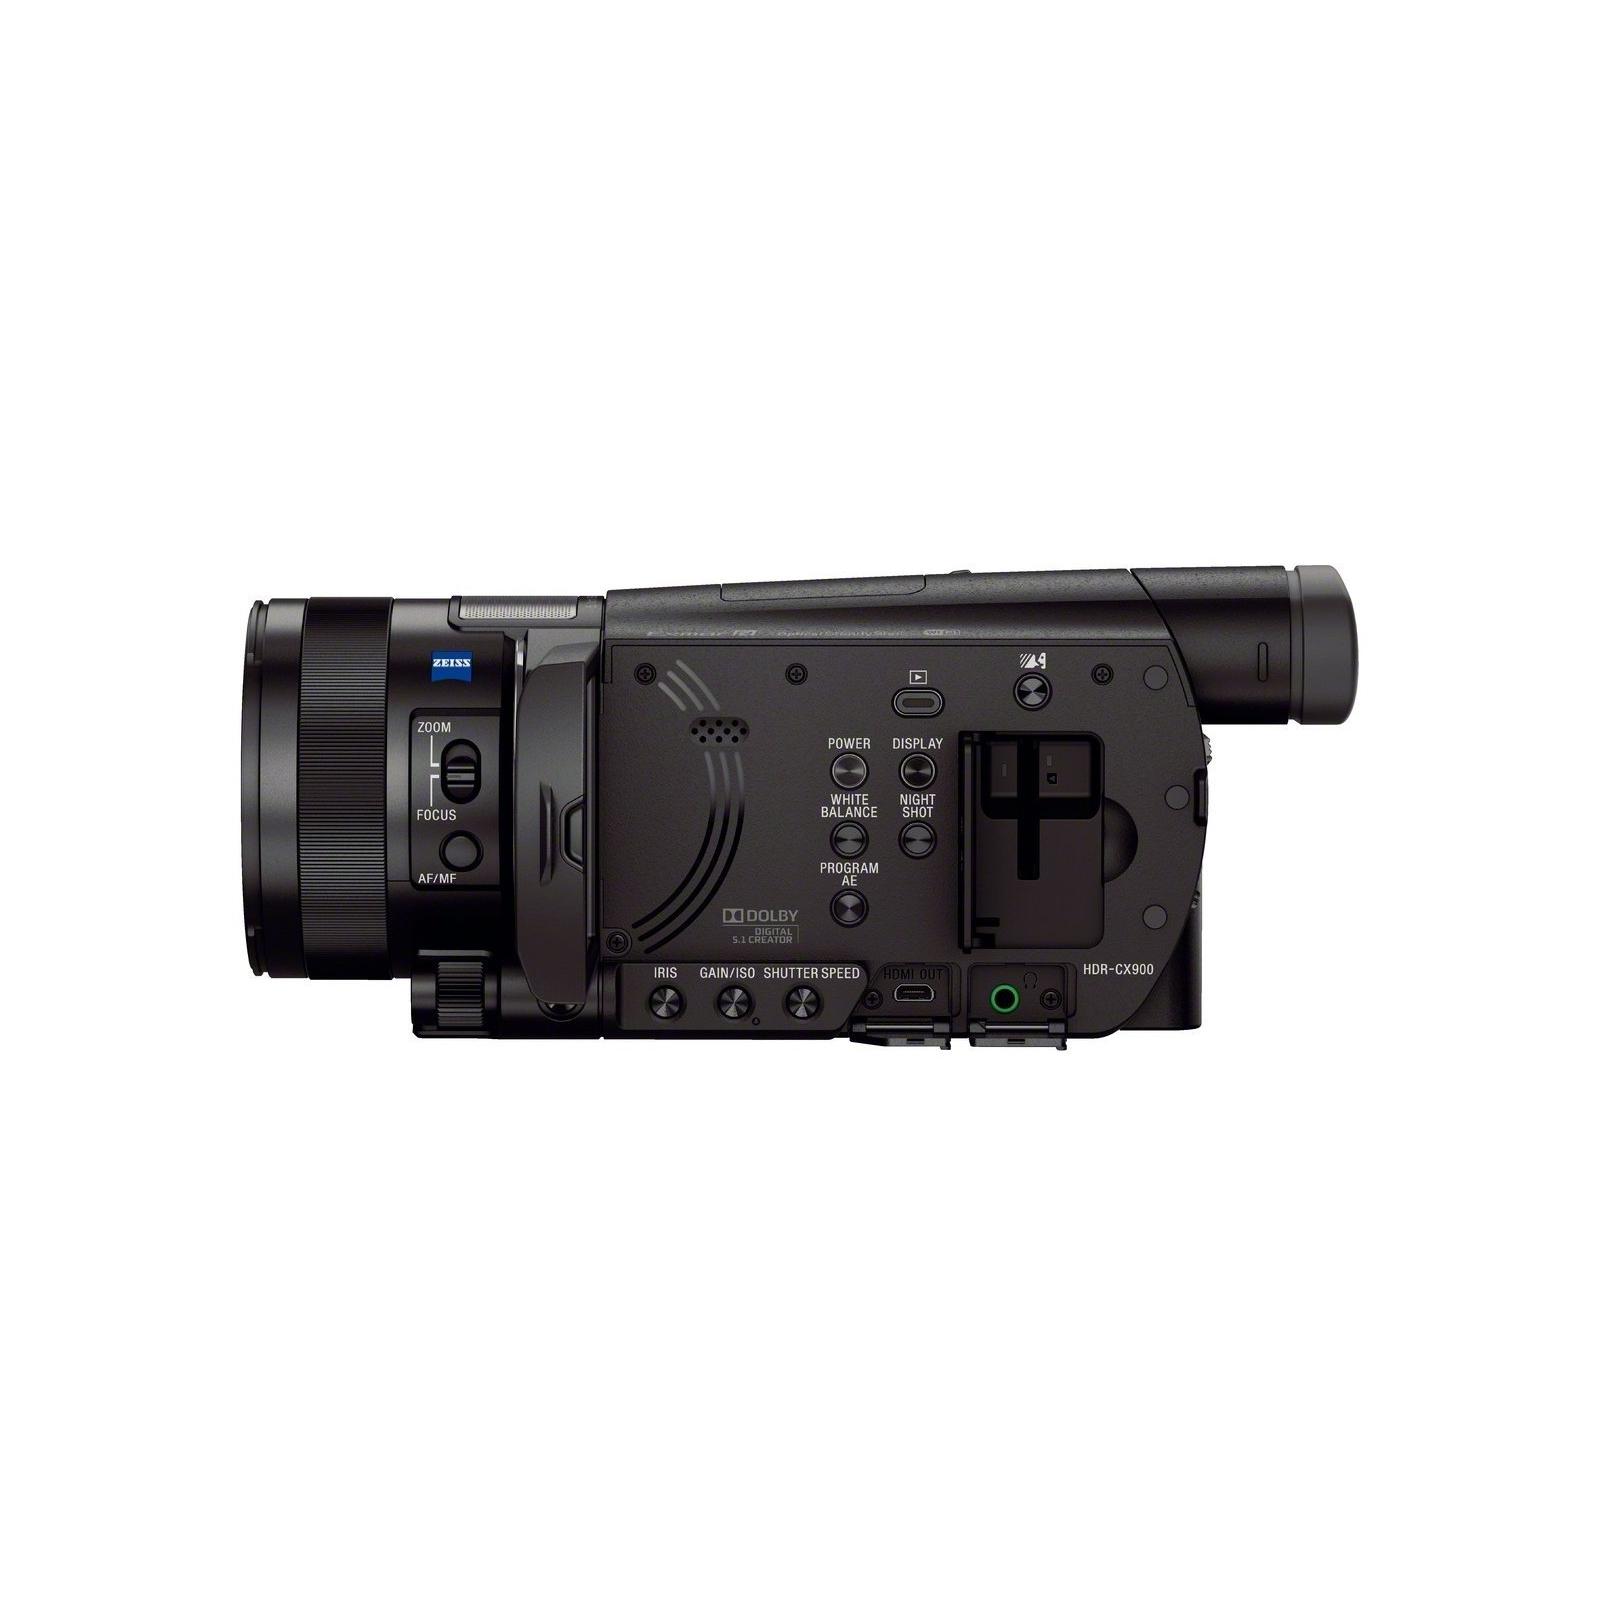 Цифровая видеокамера SONY Handycam HDR-CX900 Black (HDRCX900EB.CEN) изображение 6